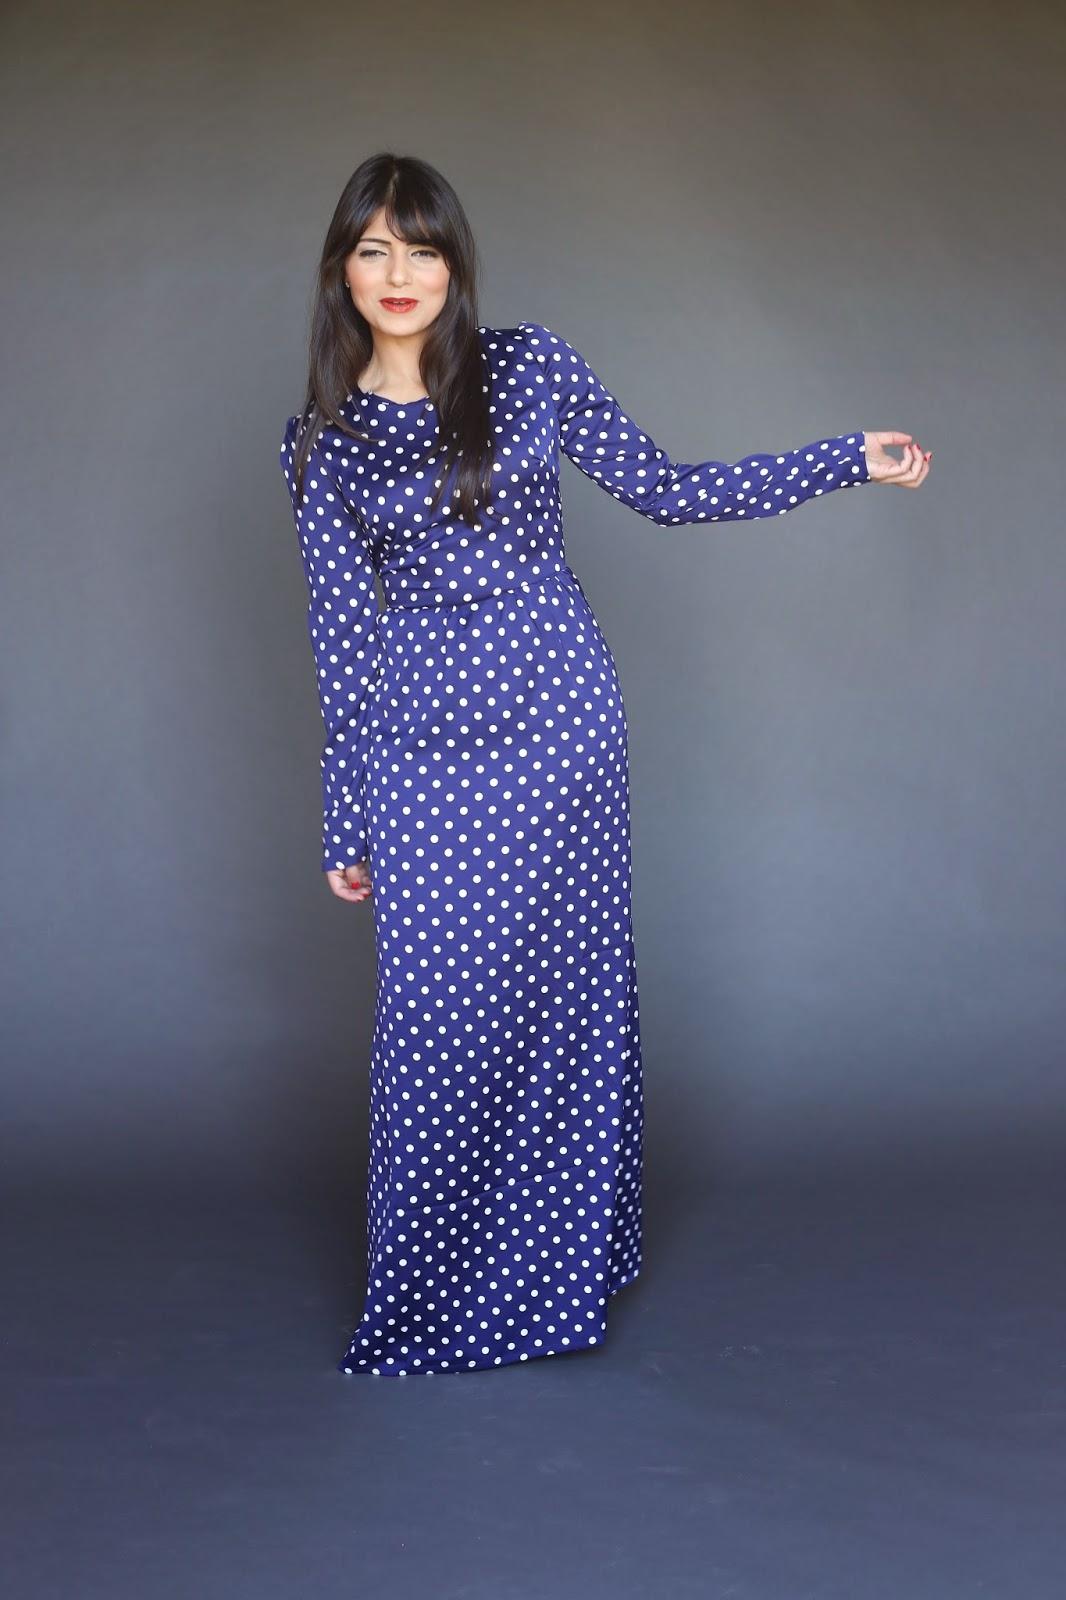 Modest long sleeve blue polkadot maxi dress with long sleeves and satin finish lds mormon tznius hijab fashion style